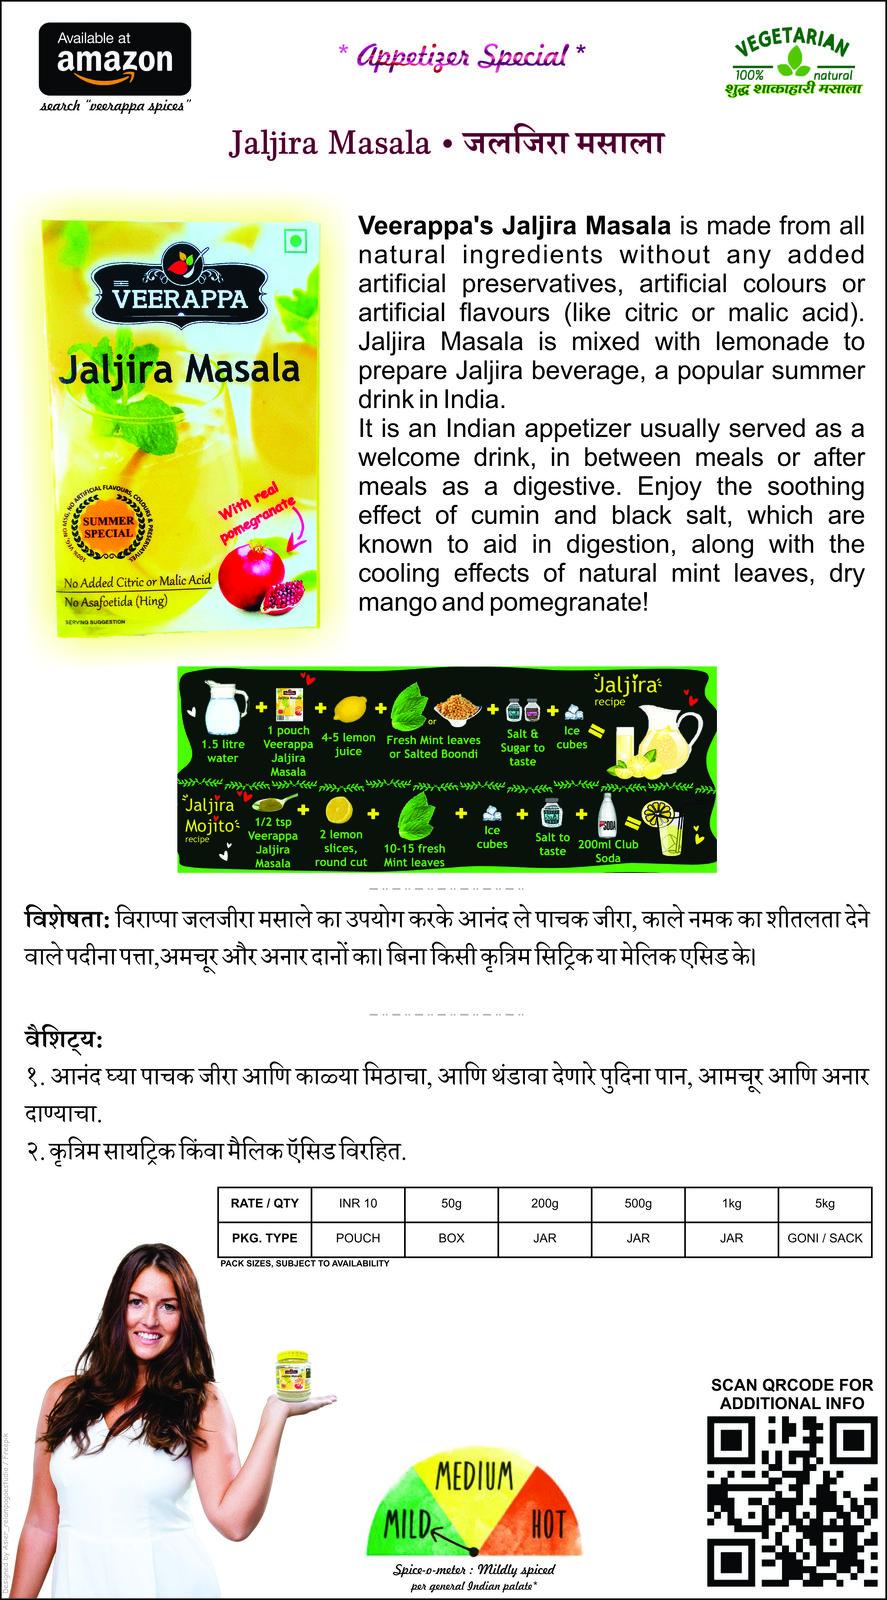 Appetizer and Seasoning Box (Pack of 4 Masala - Chai, Jaljira, Chat, Jeeravan)